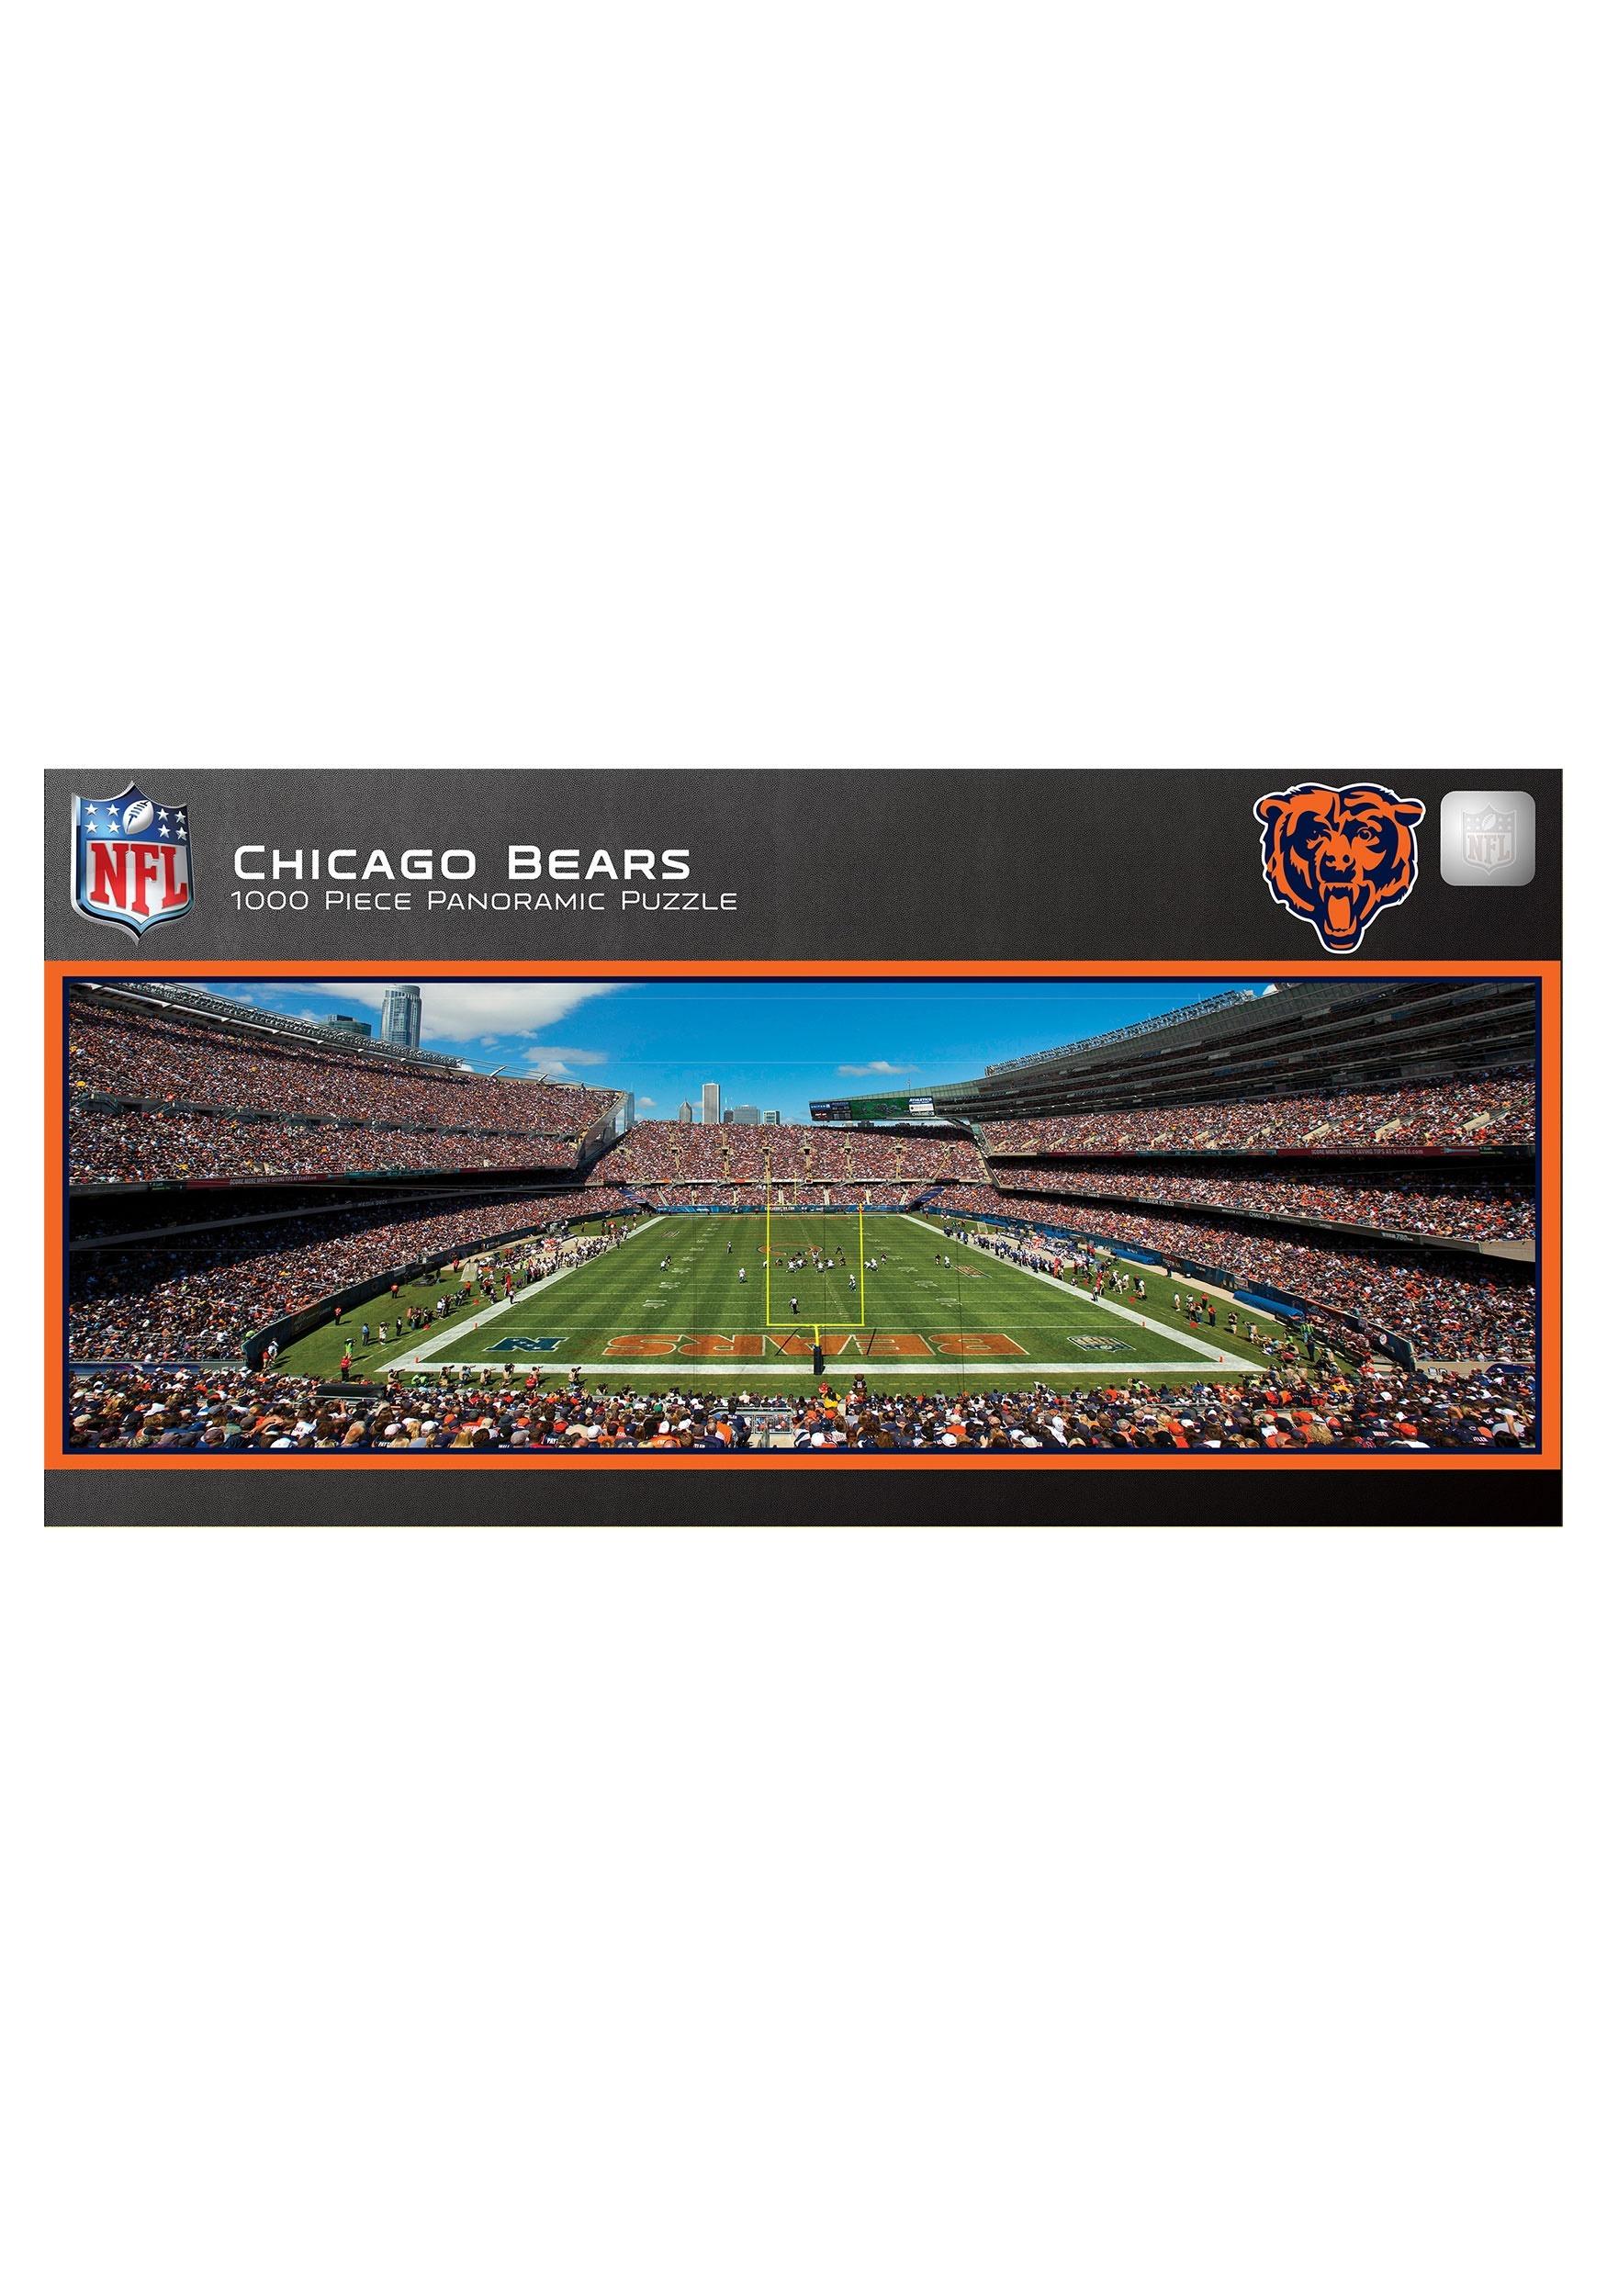 Chicago Bears NFL 1000 Piece Stadium Puzzle